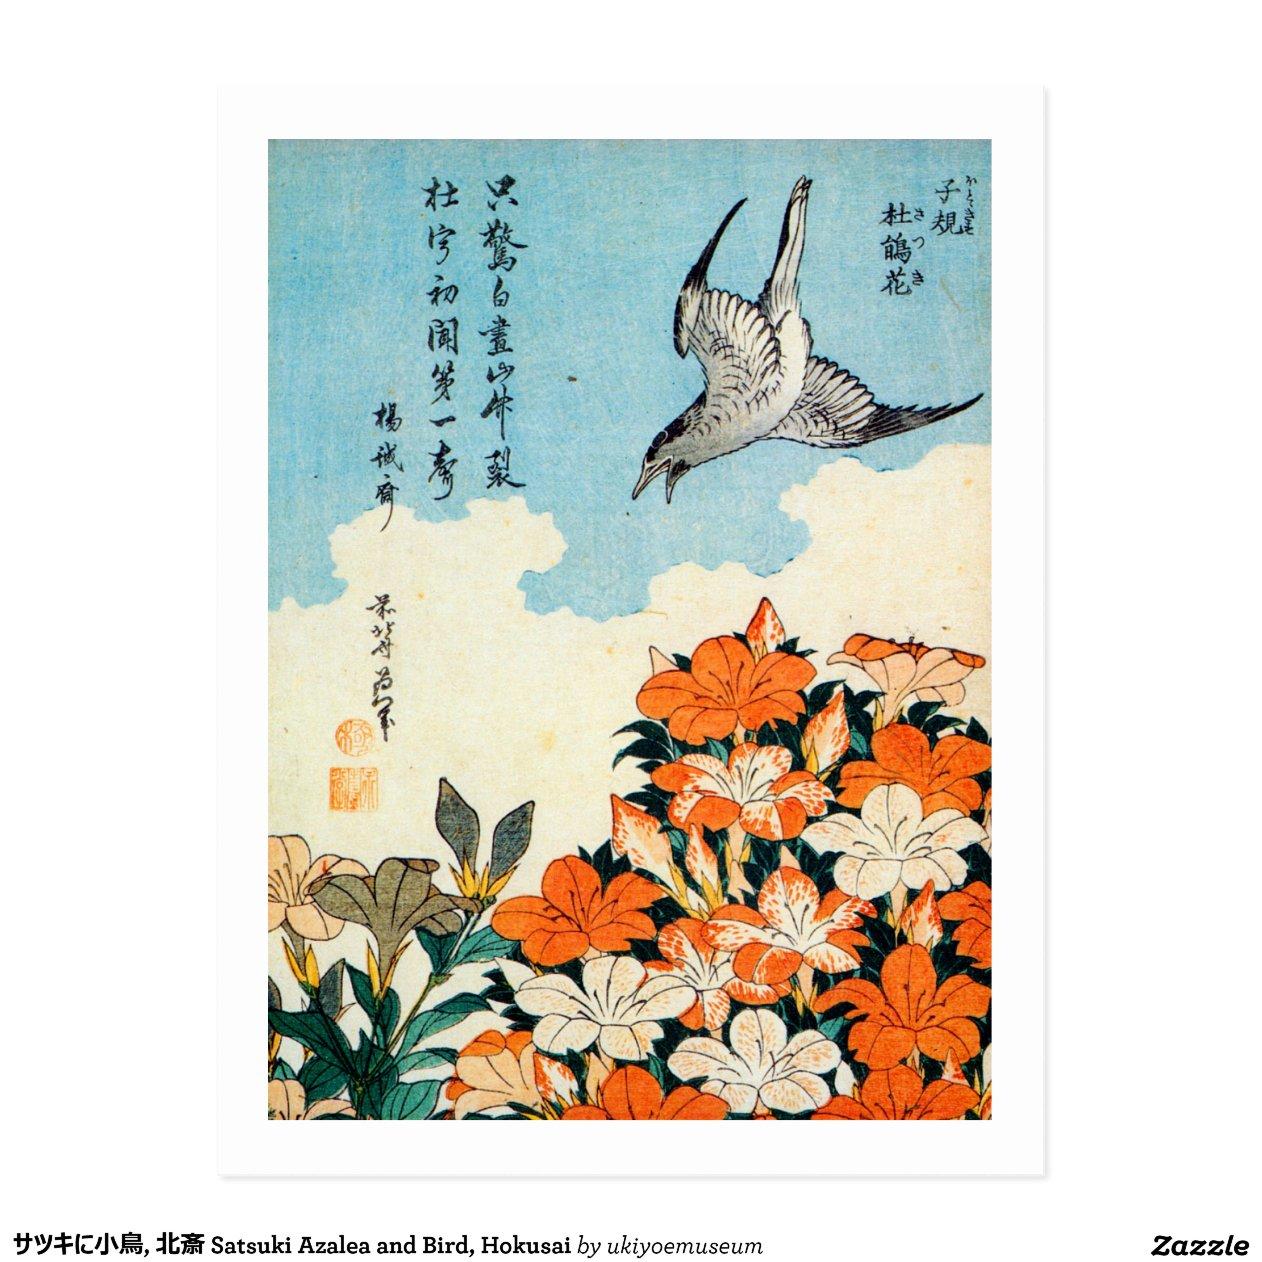 azal e de satsuki de et oiseau hokusai carte postale zazzle. Black Bedroom Furniture Sets. Home Design Ideas